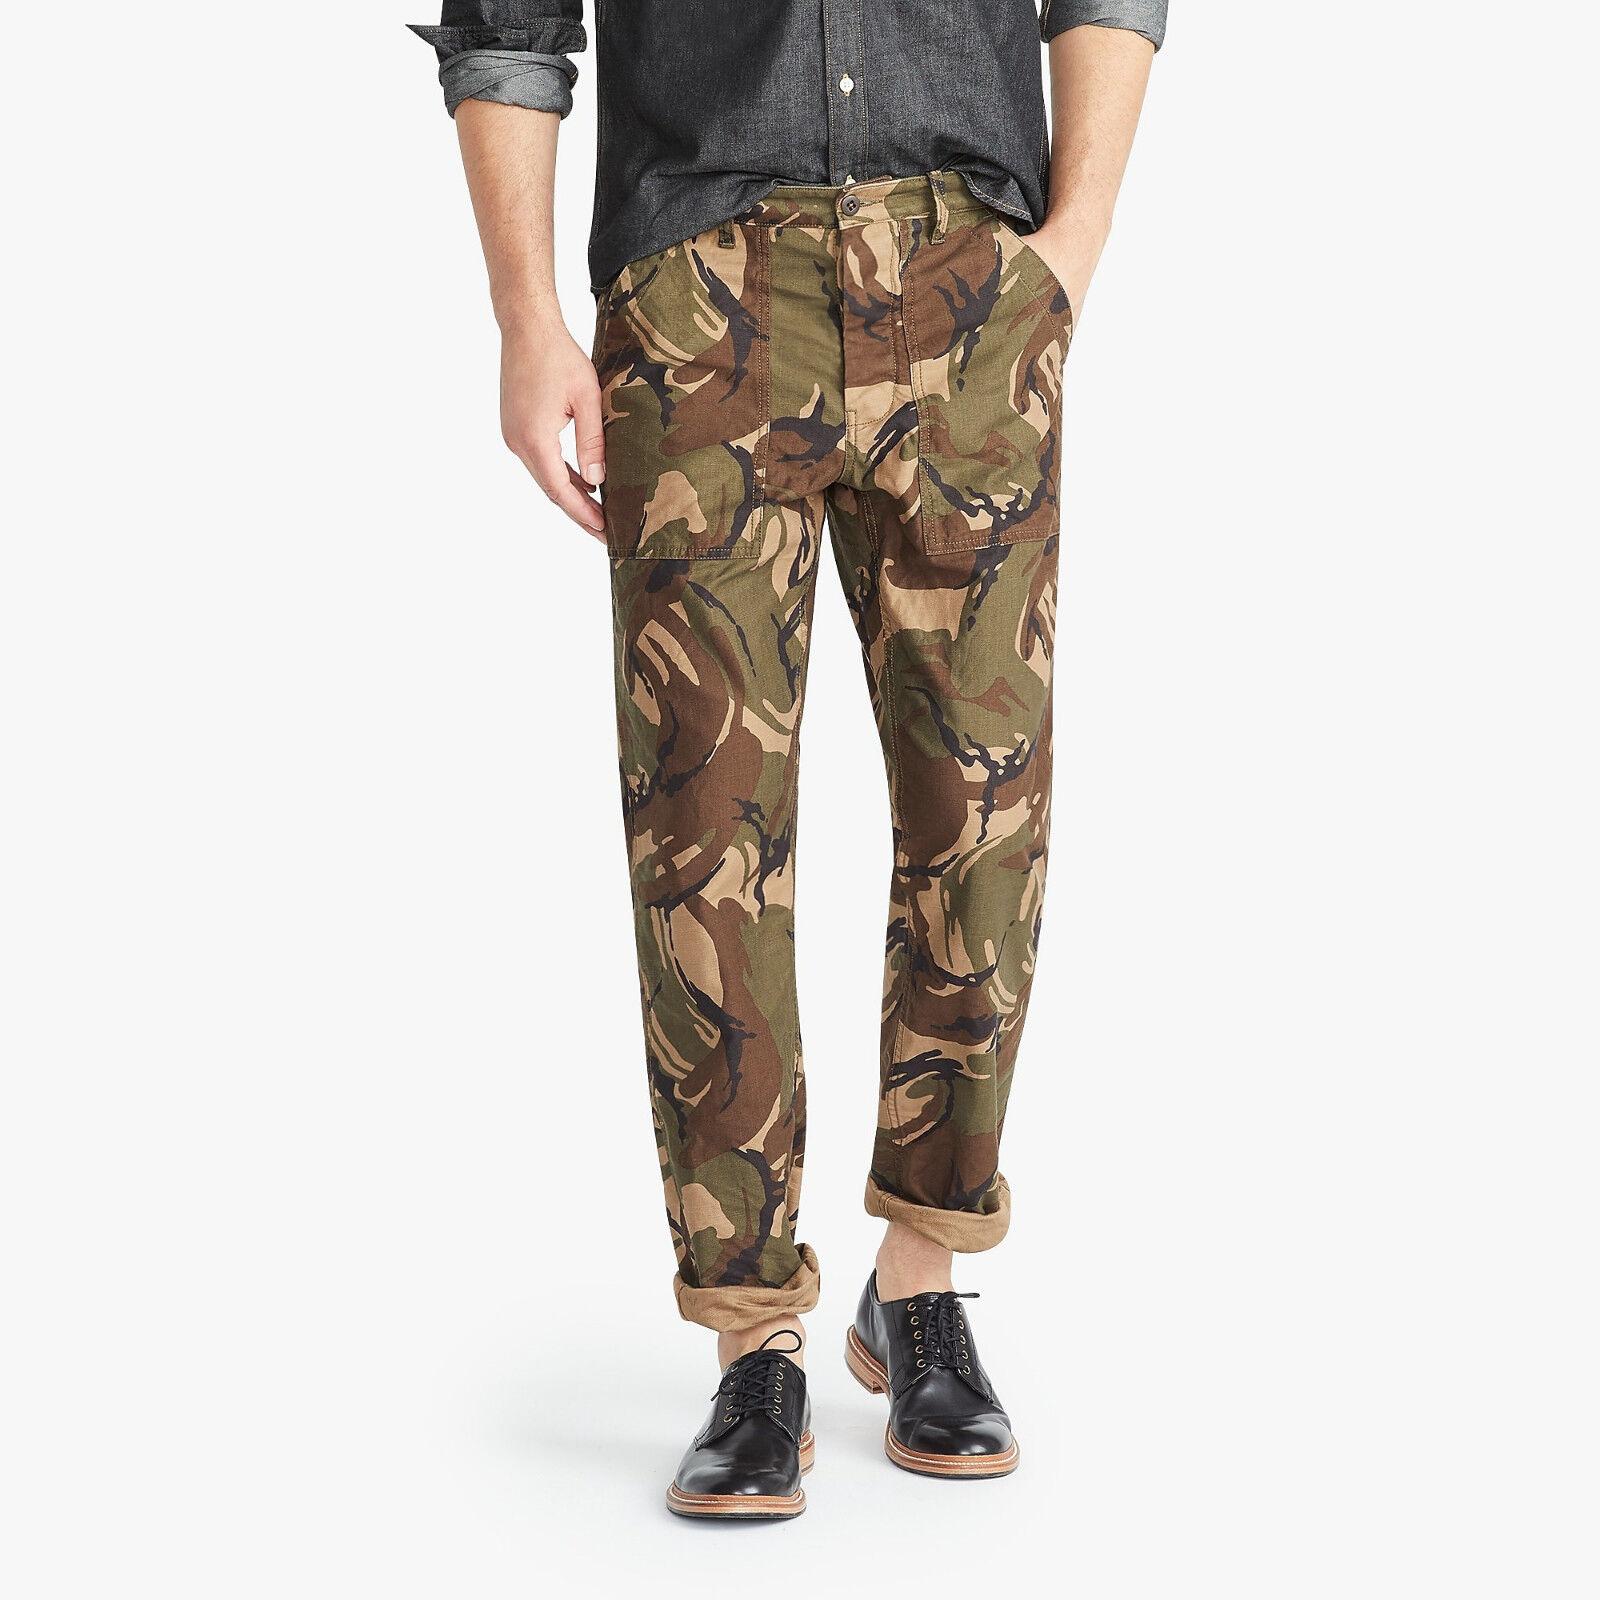 Wallace & Barnes J. Crew Men's Military Style Camo Camp Pants BRAND NEW 33x32